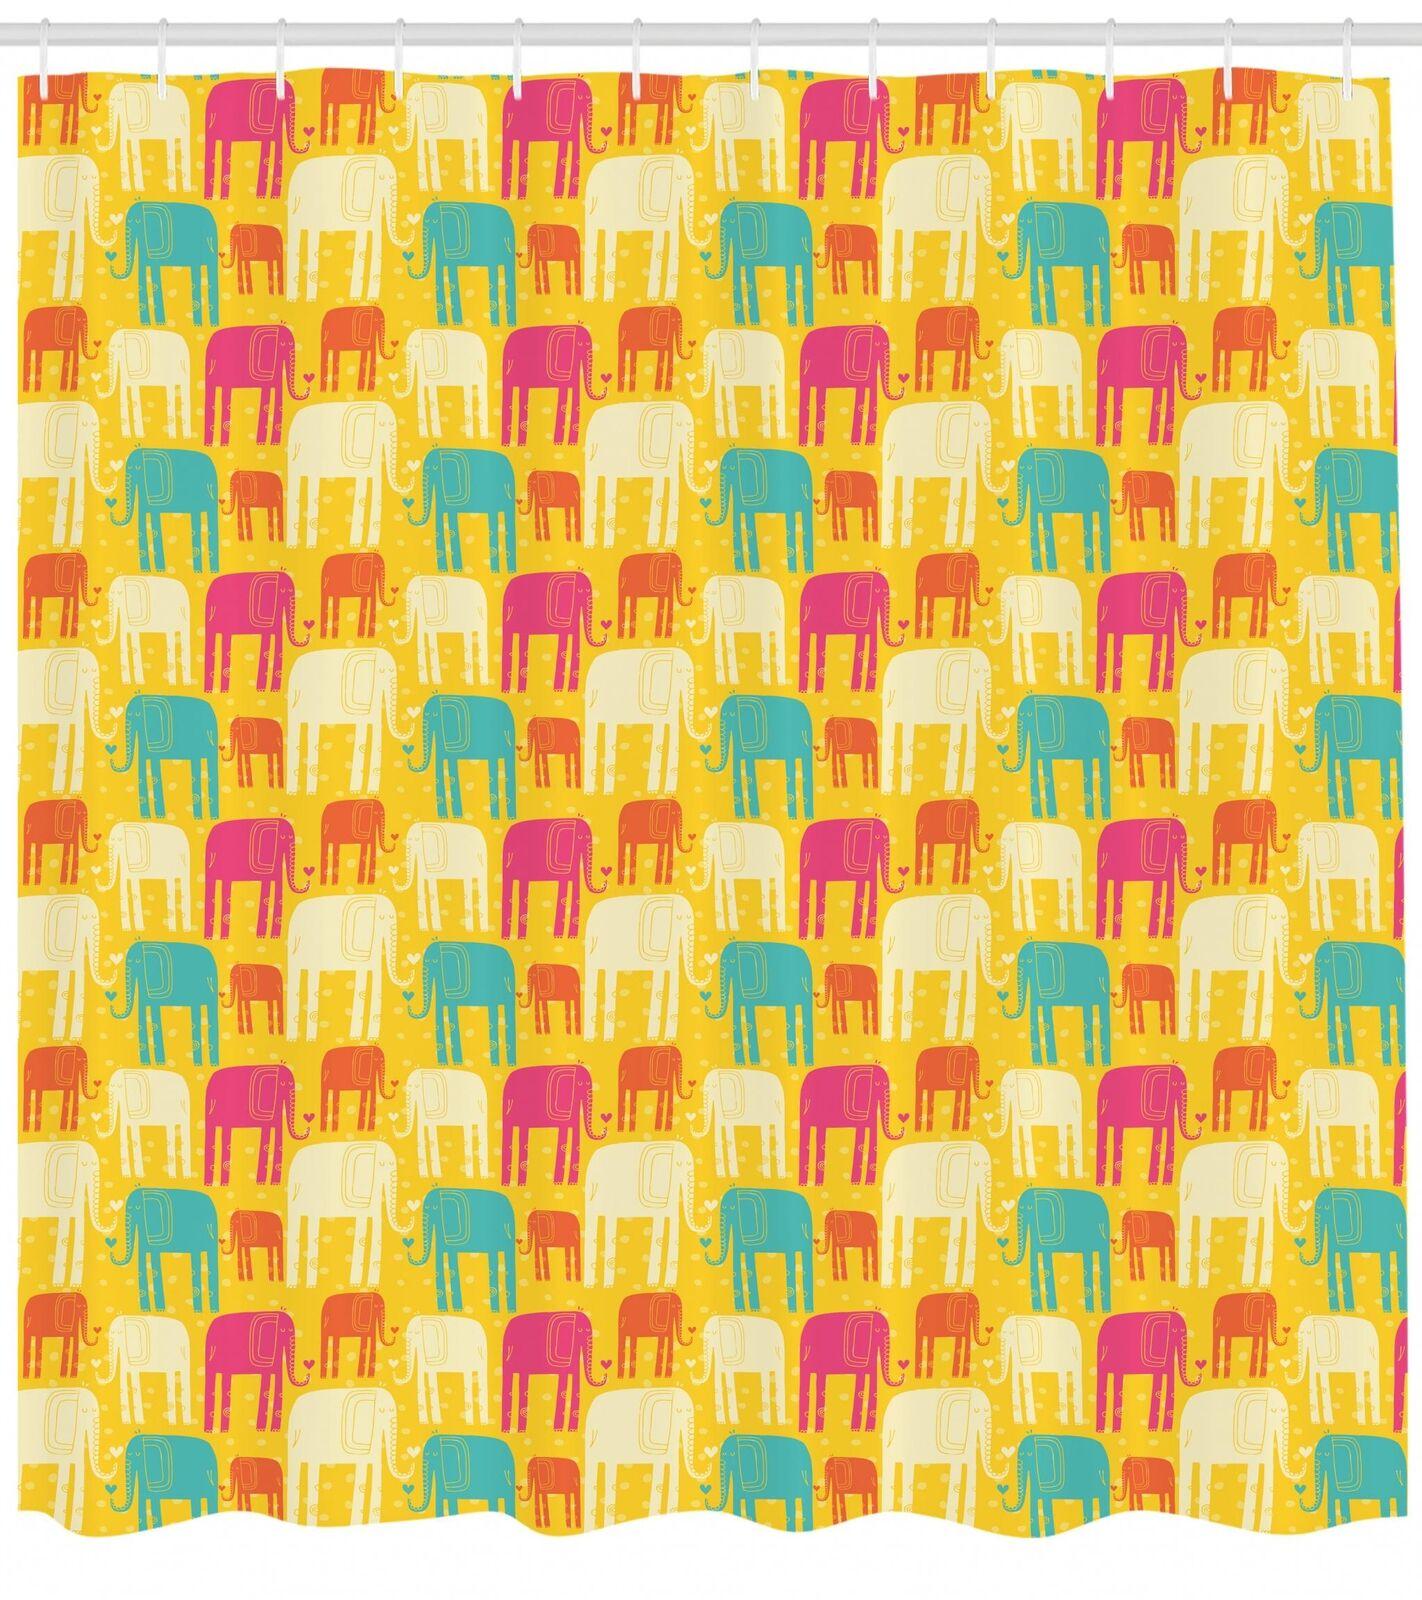 Safari Pattern Shower Curtain Fabric Decor Set with Hooks 4 Größes